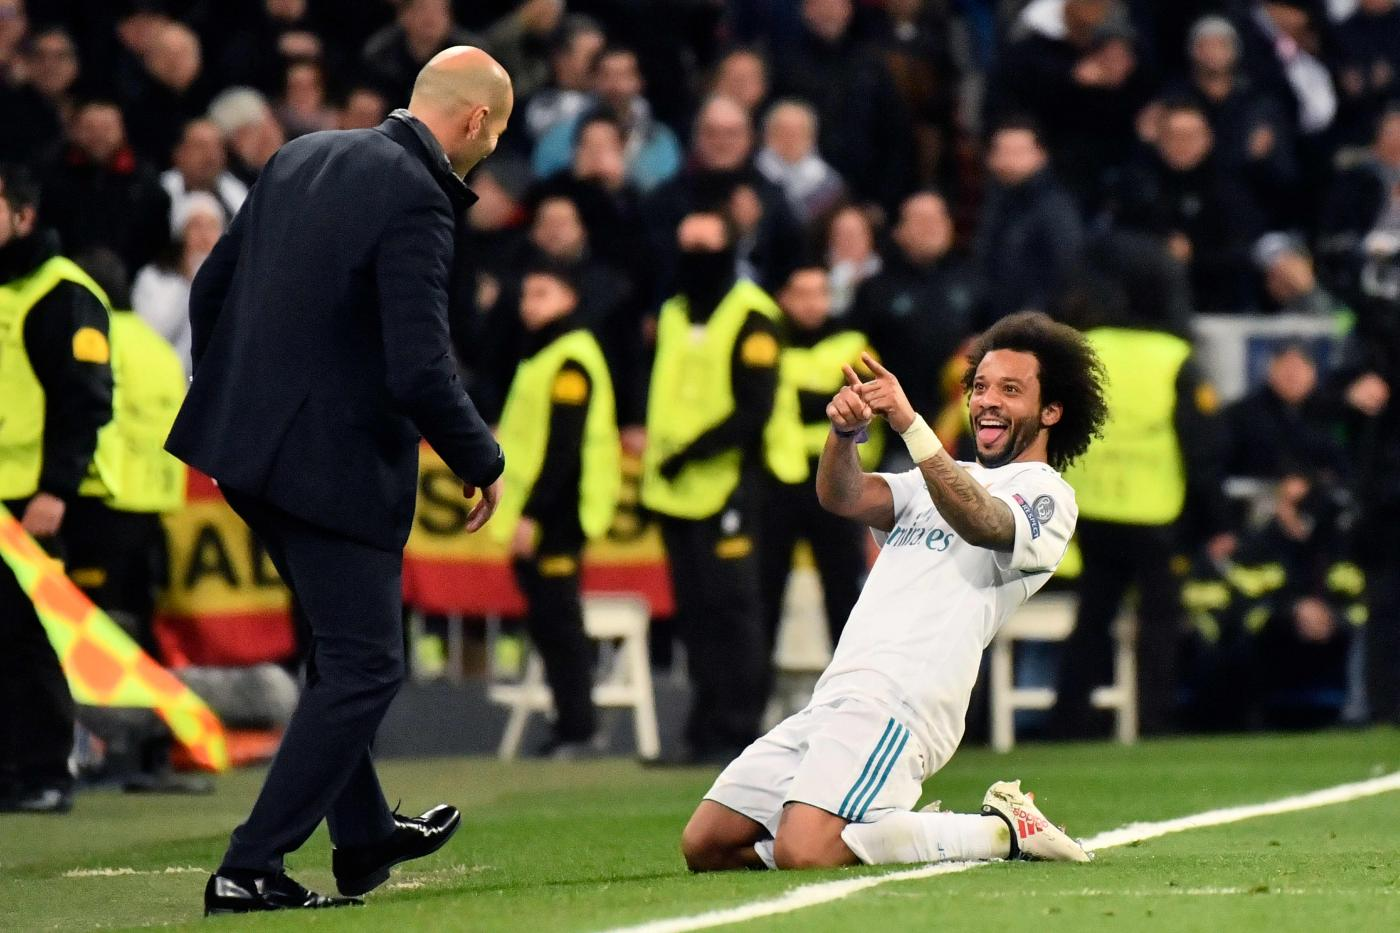 Espanyol-Real Madrid martedì 27 febbraio, analisi e pronostico LaLiga giornata 26